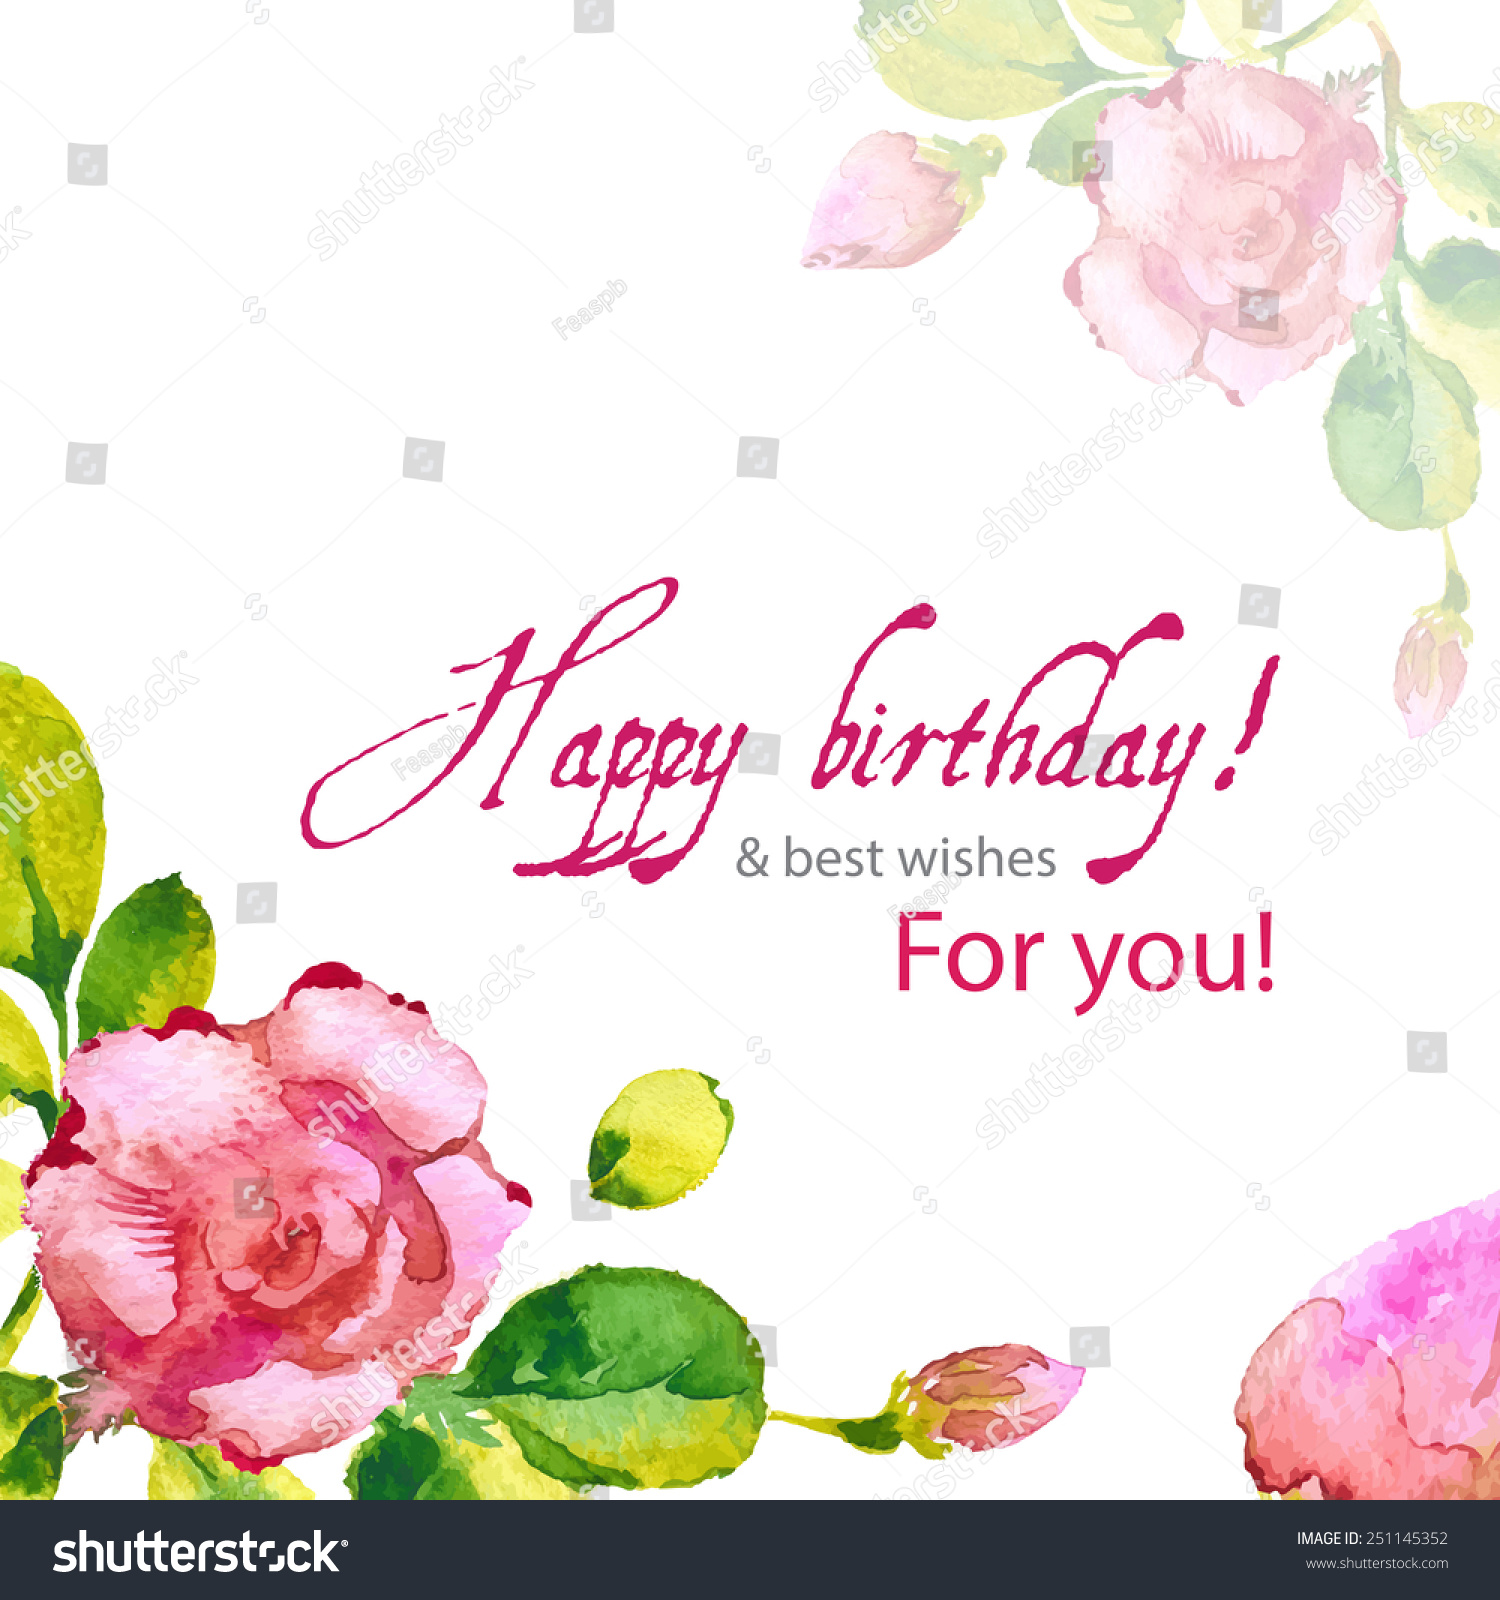 Happy birthday vintage flower card vector stock vector royalty free happy birthday vintage flower card vector illustration izmirmasajfo